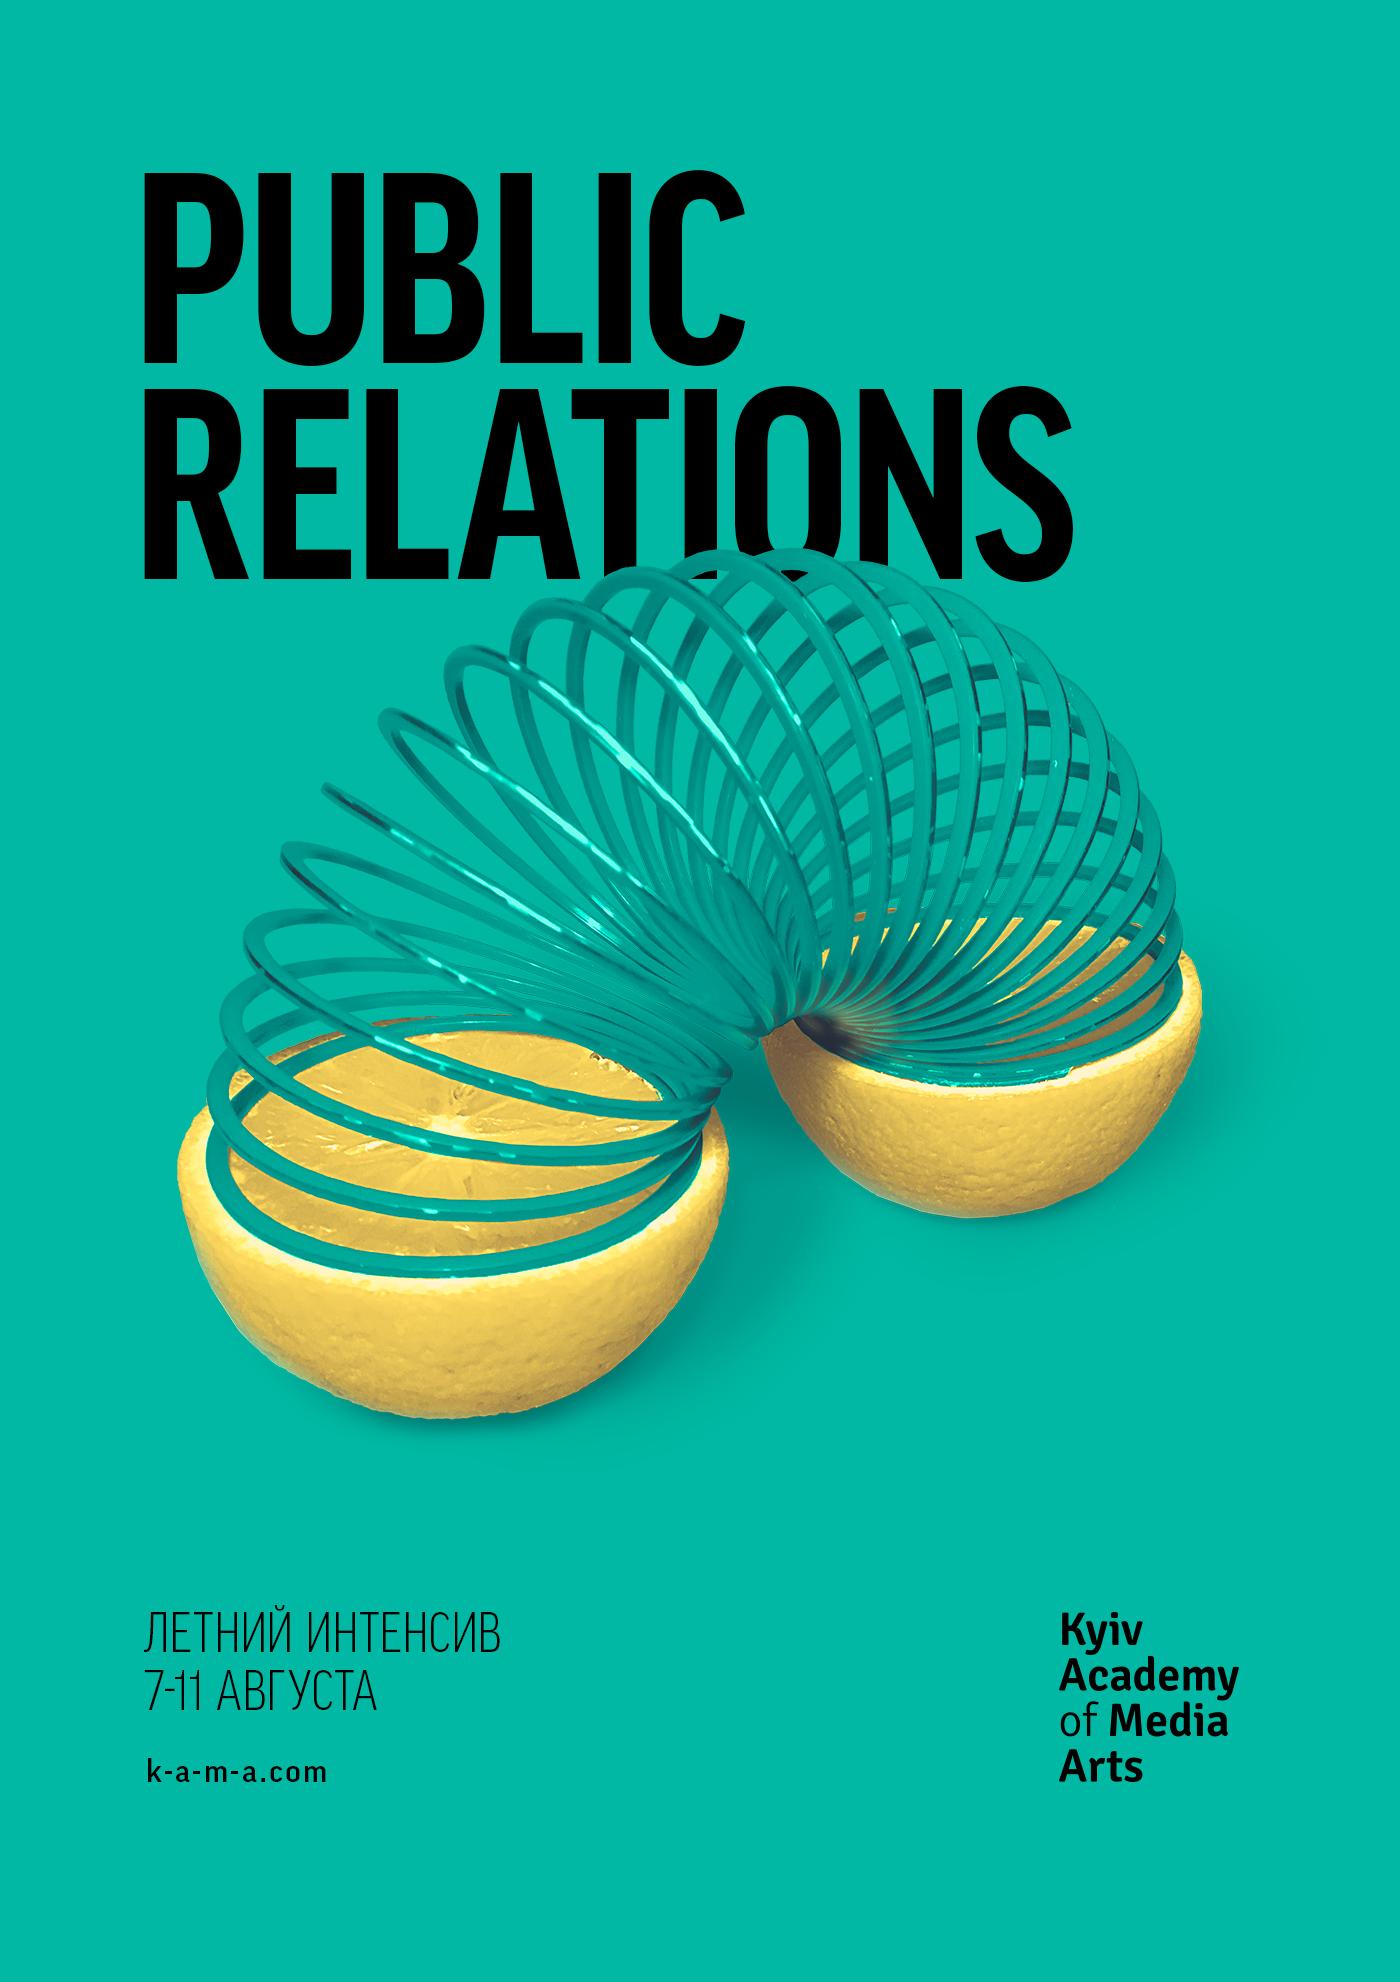 PUBLIC-_RELATIONS-WEB.png